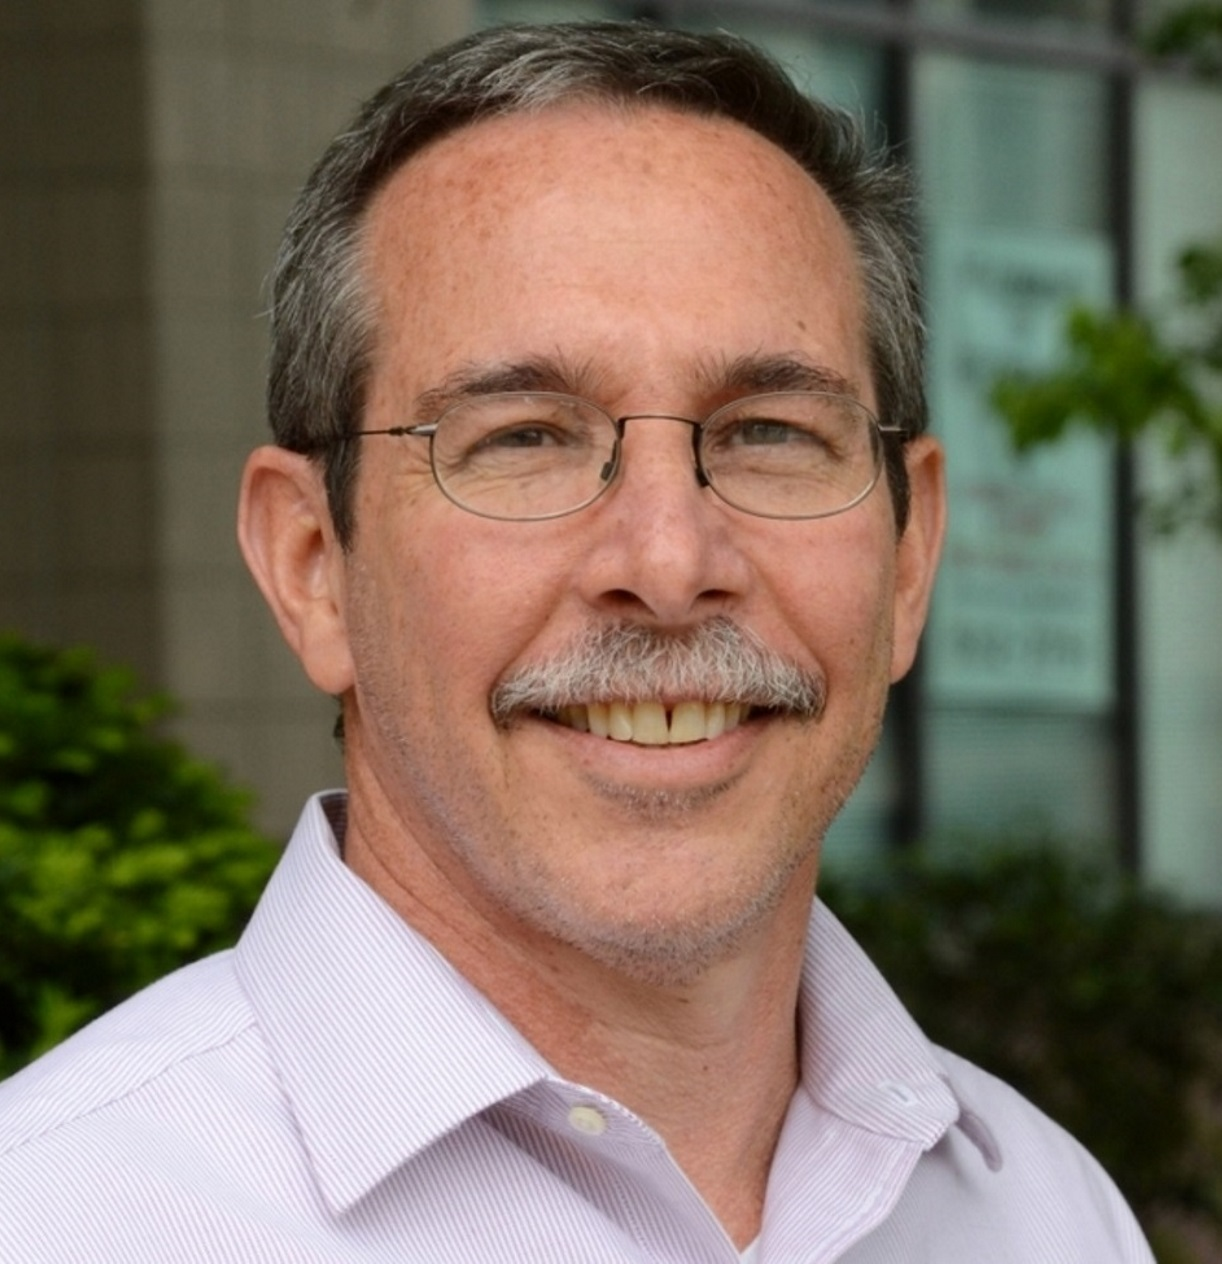 Dr. Boris Birmaher